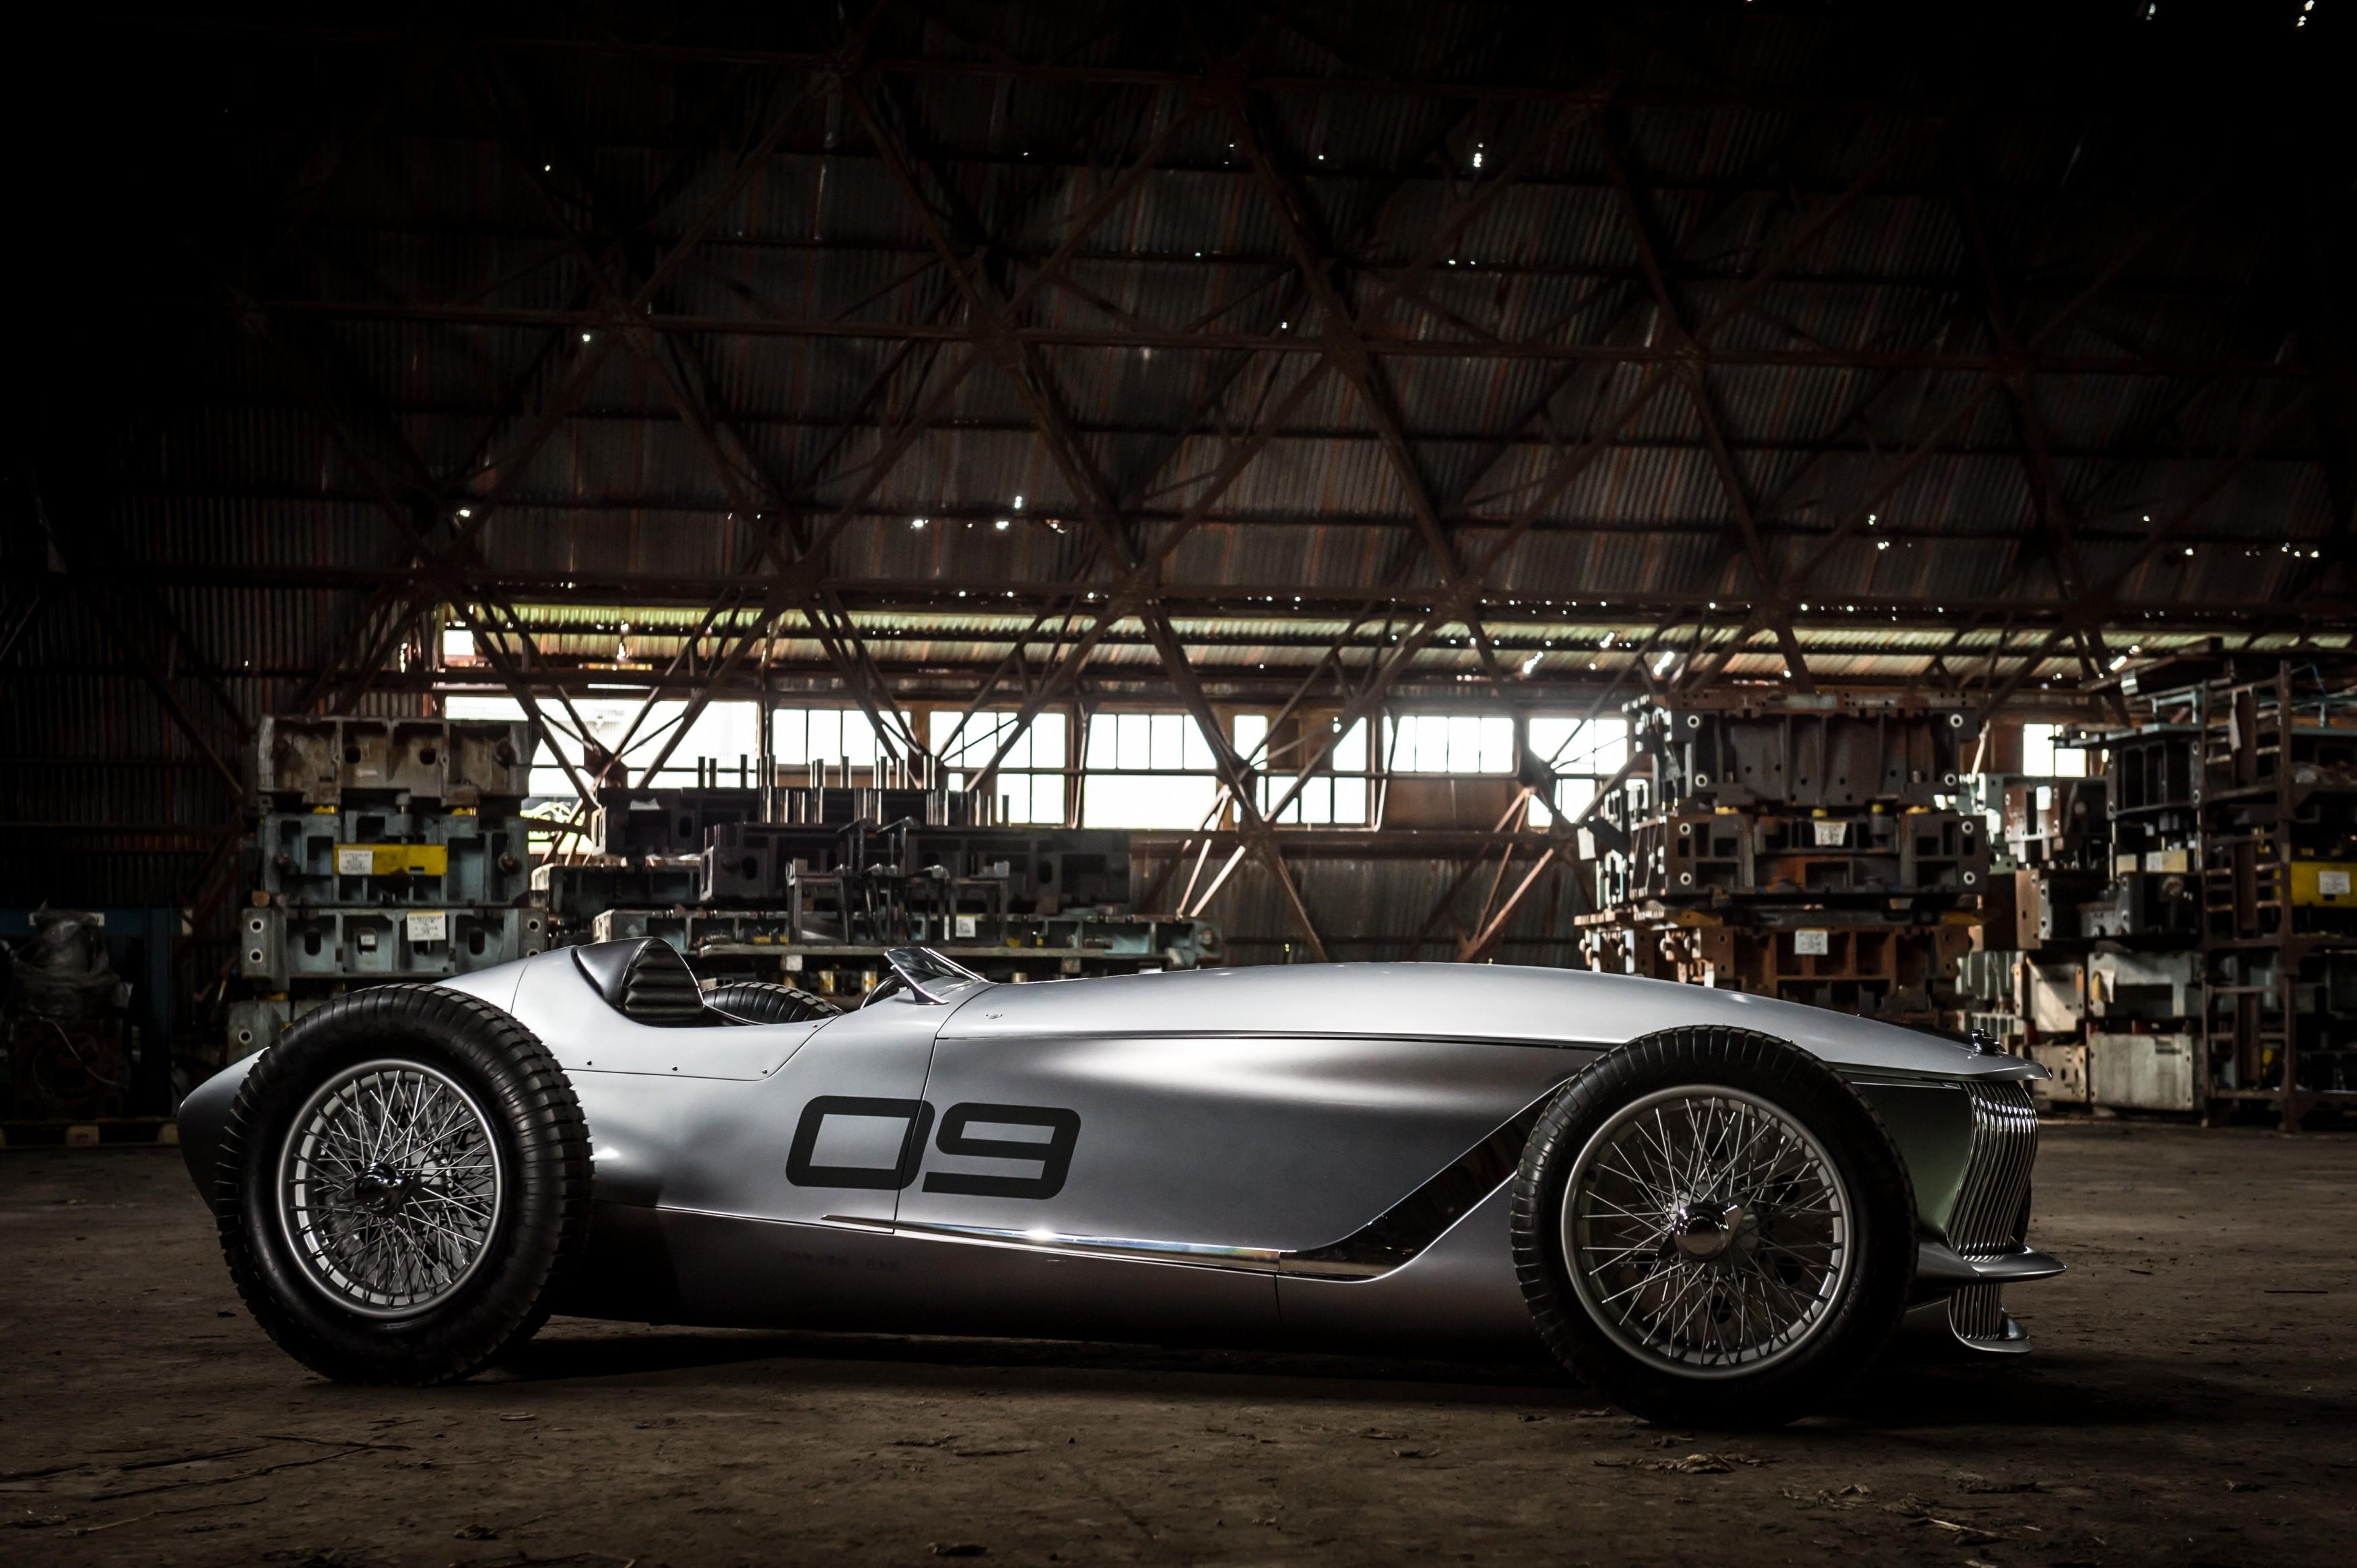 Wallpaper Infiniti Prototype 9 Cars 2018 Electric Cars